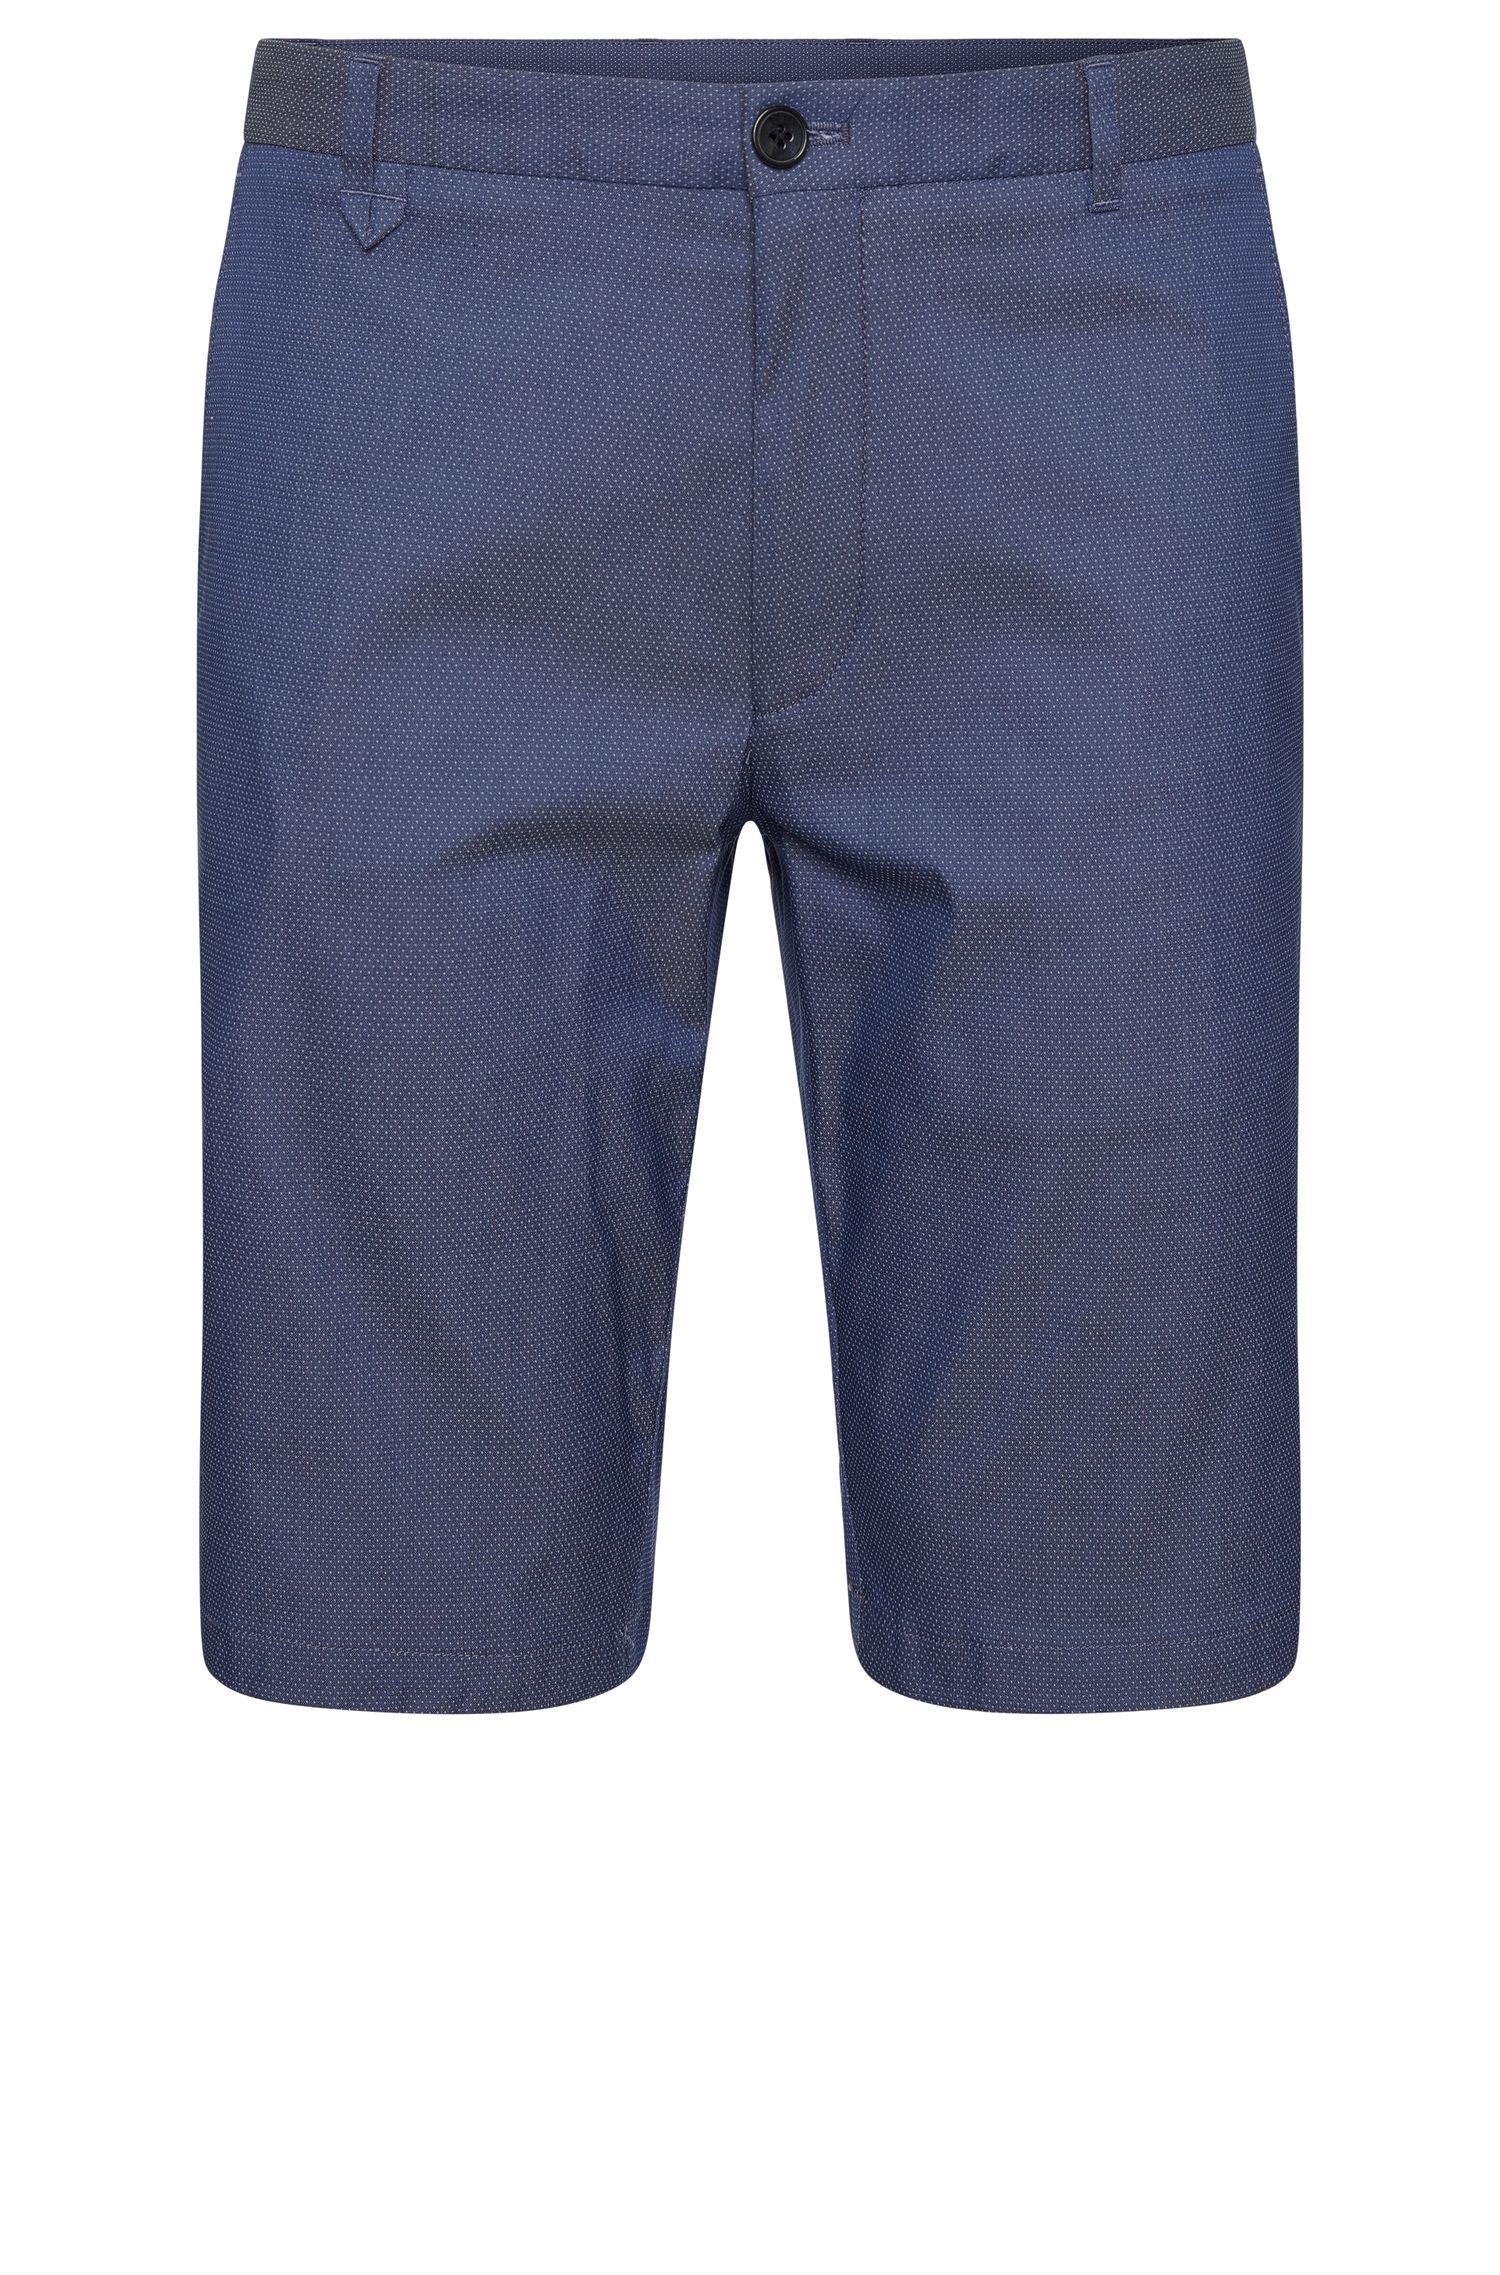 Polka dot pattern slim-fit shorts in cotton blend: 'Hano3'